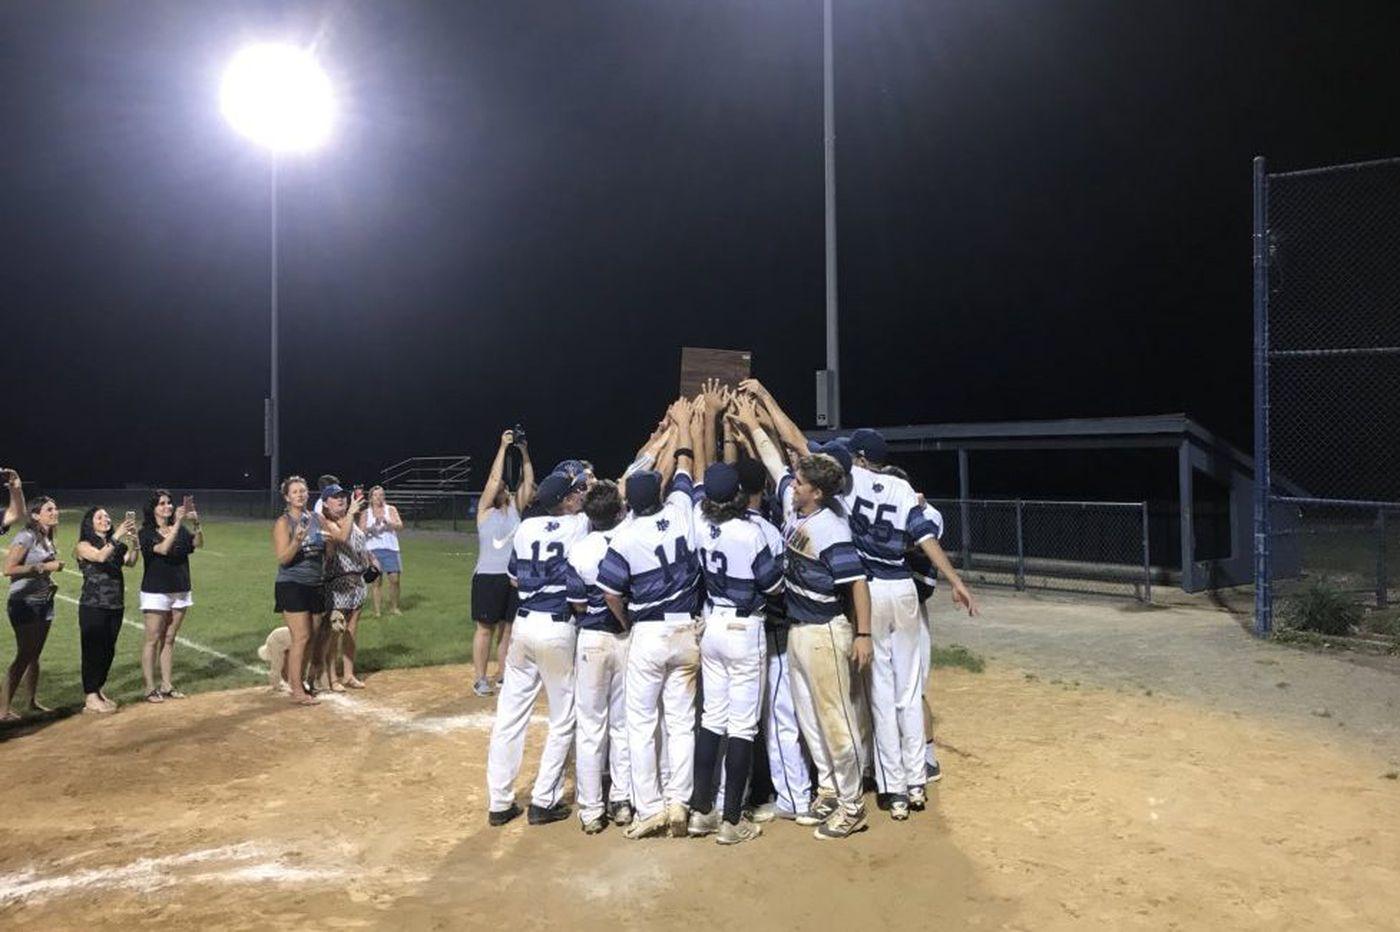 Saturday's Pa. roundup: Malvern baseball captures second straight PAISSA title